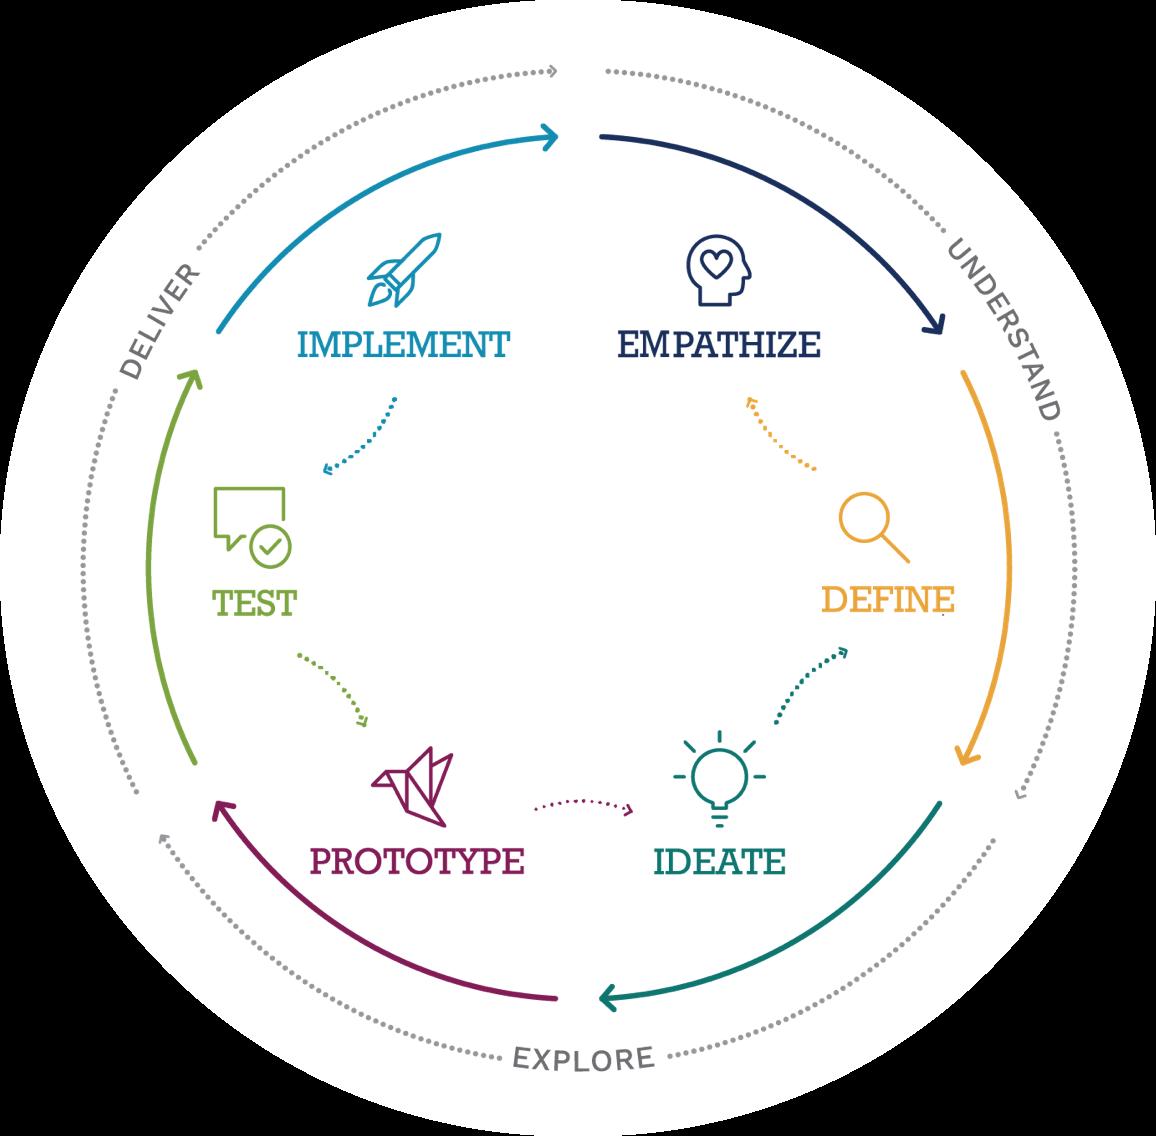 circular process diagram: empathize - define - ideate - prototype - implement